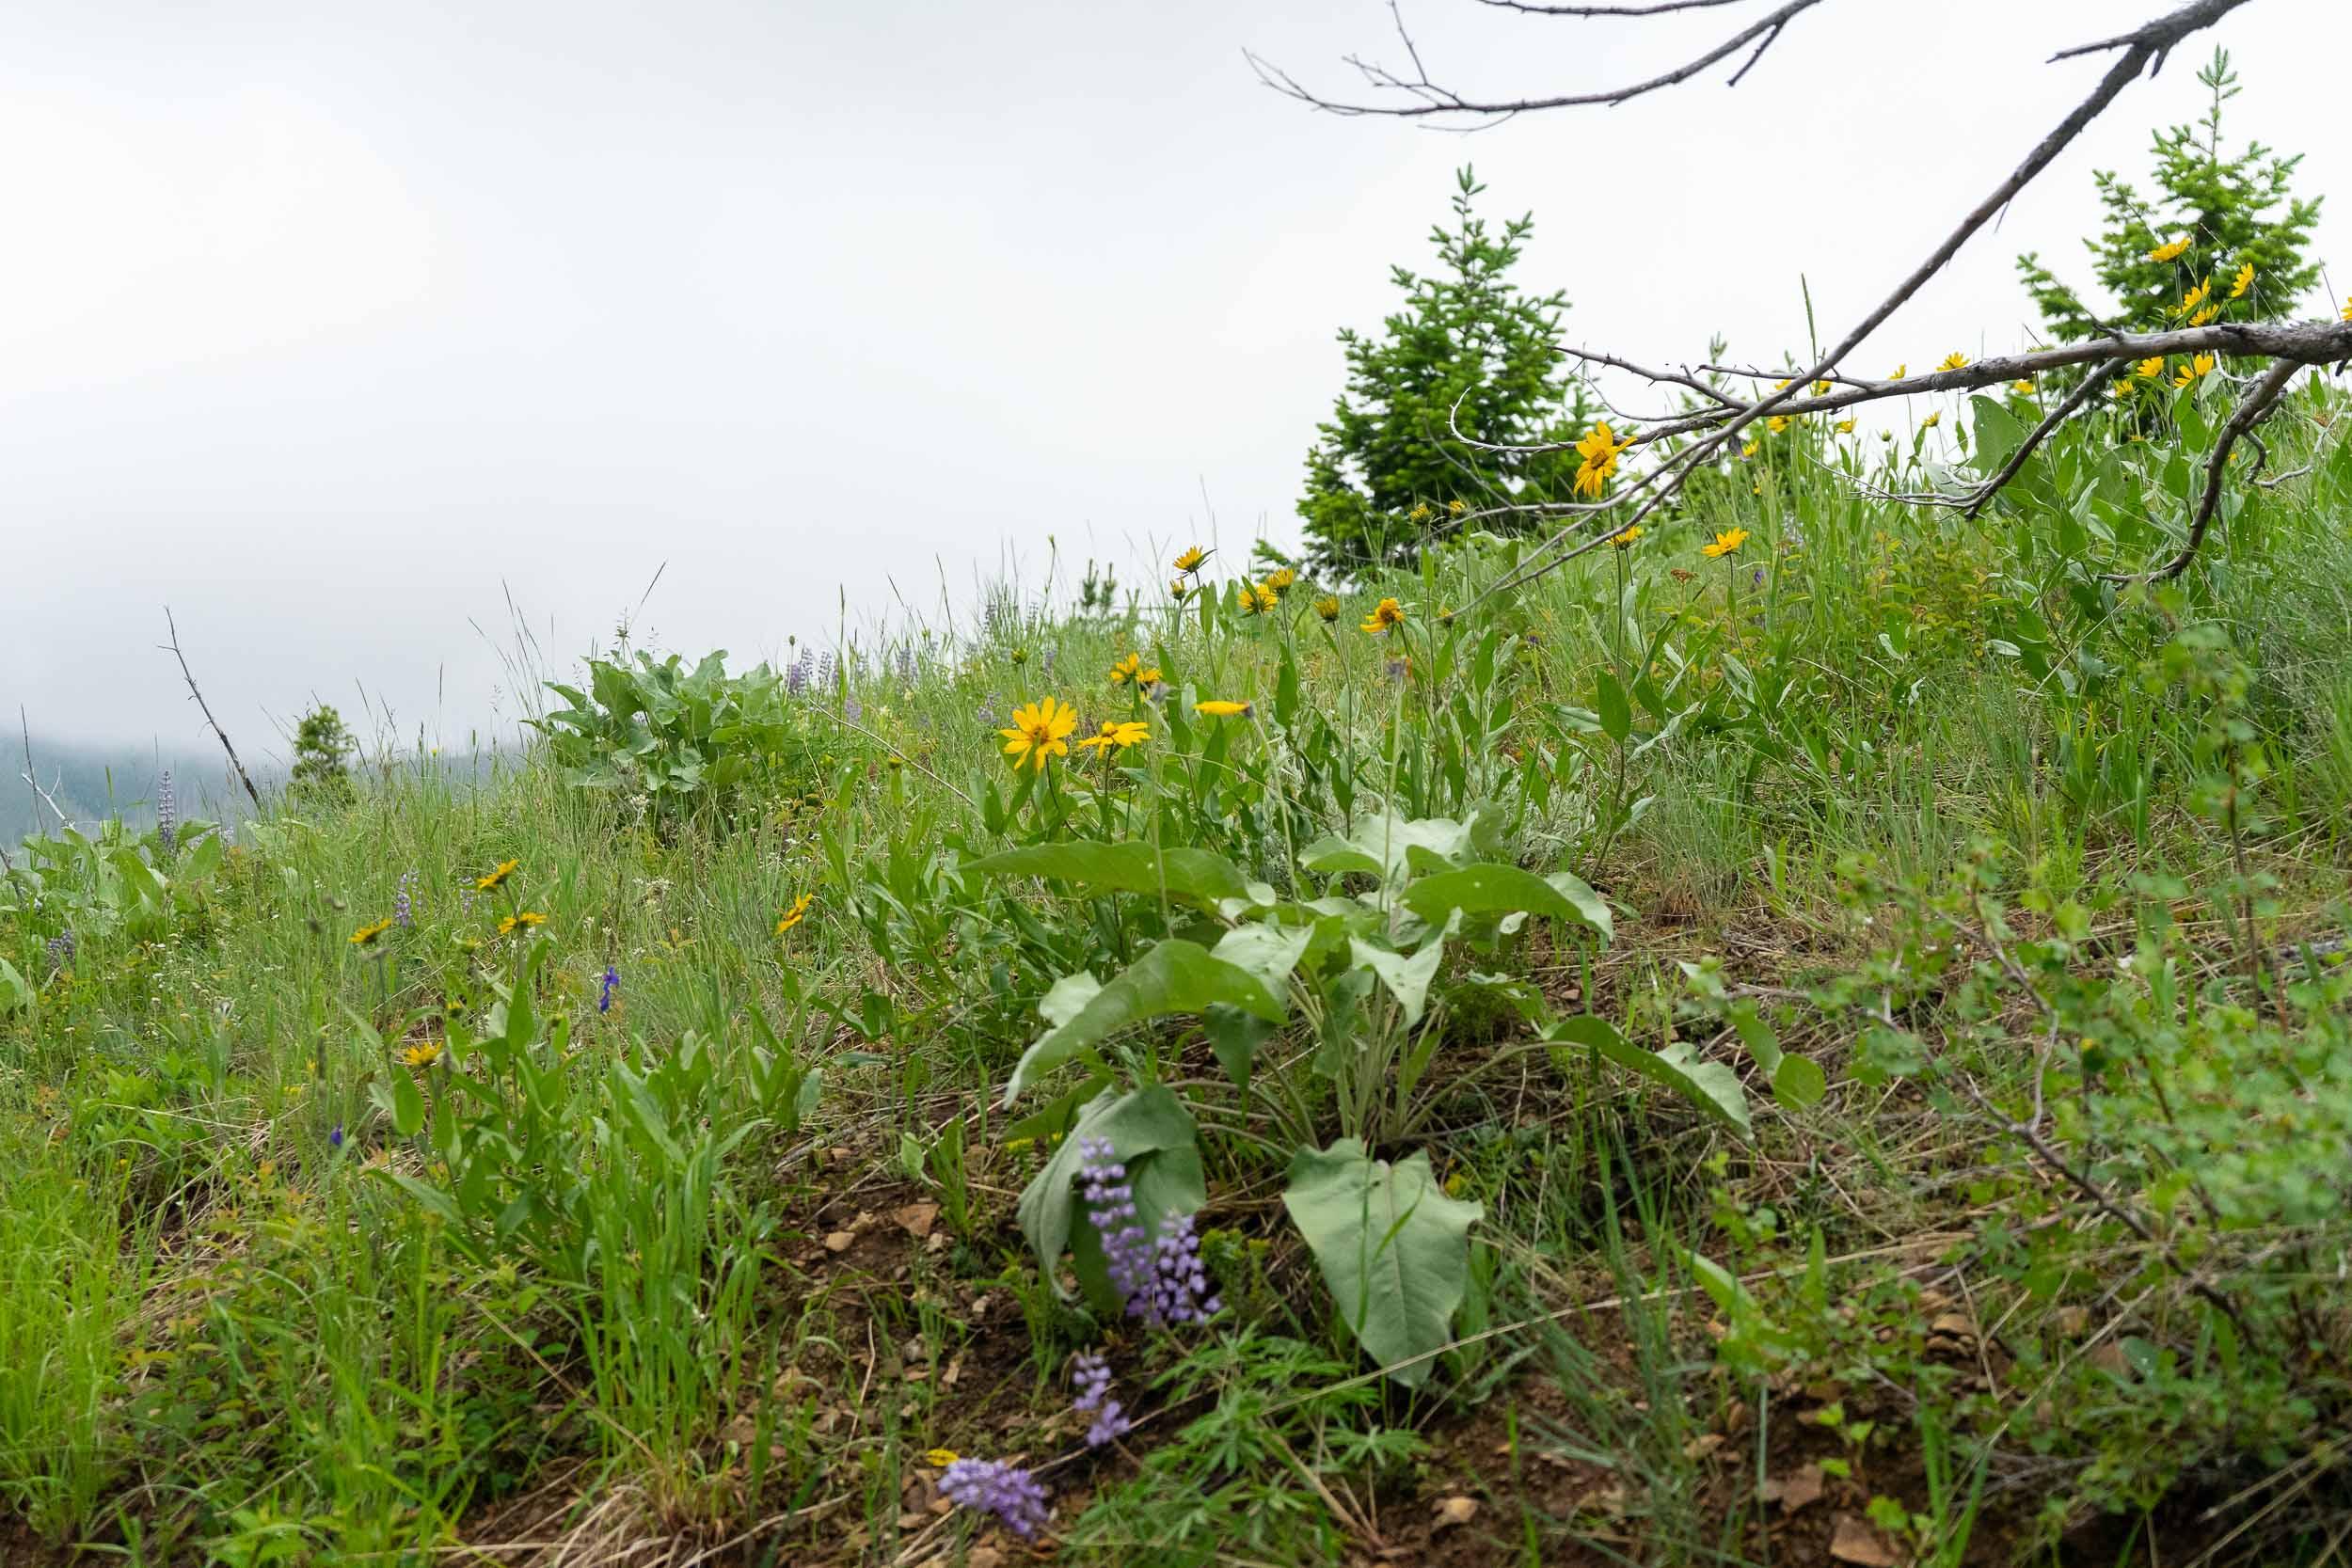 Beautiful wild flowers nears Deer Creek Cabin forest service cabin near Big Timber, Montana